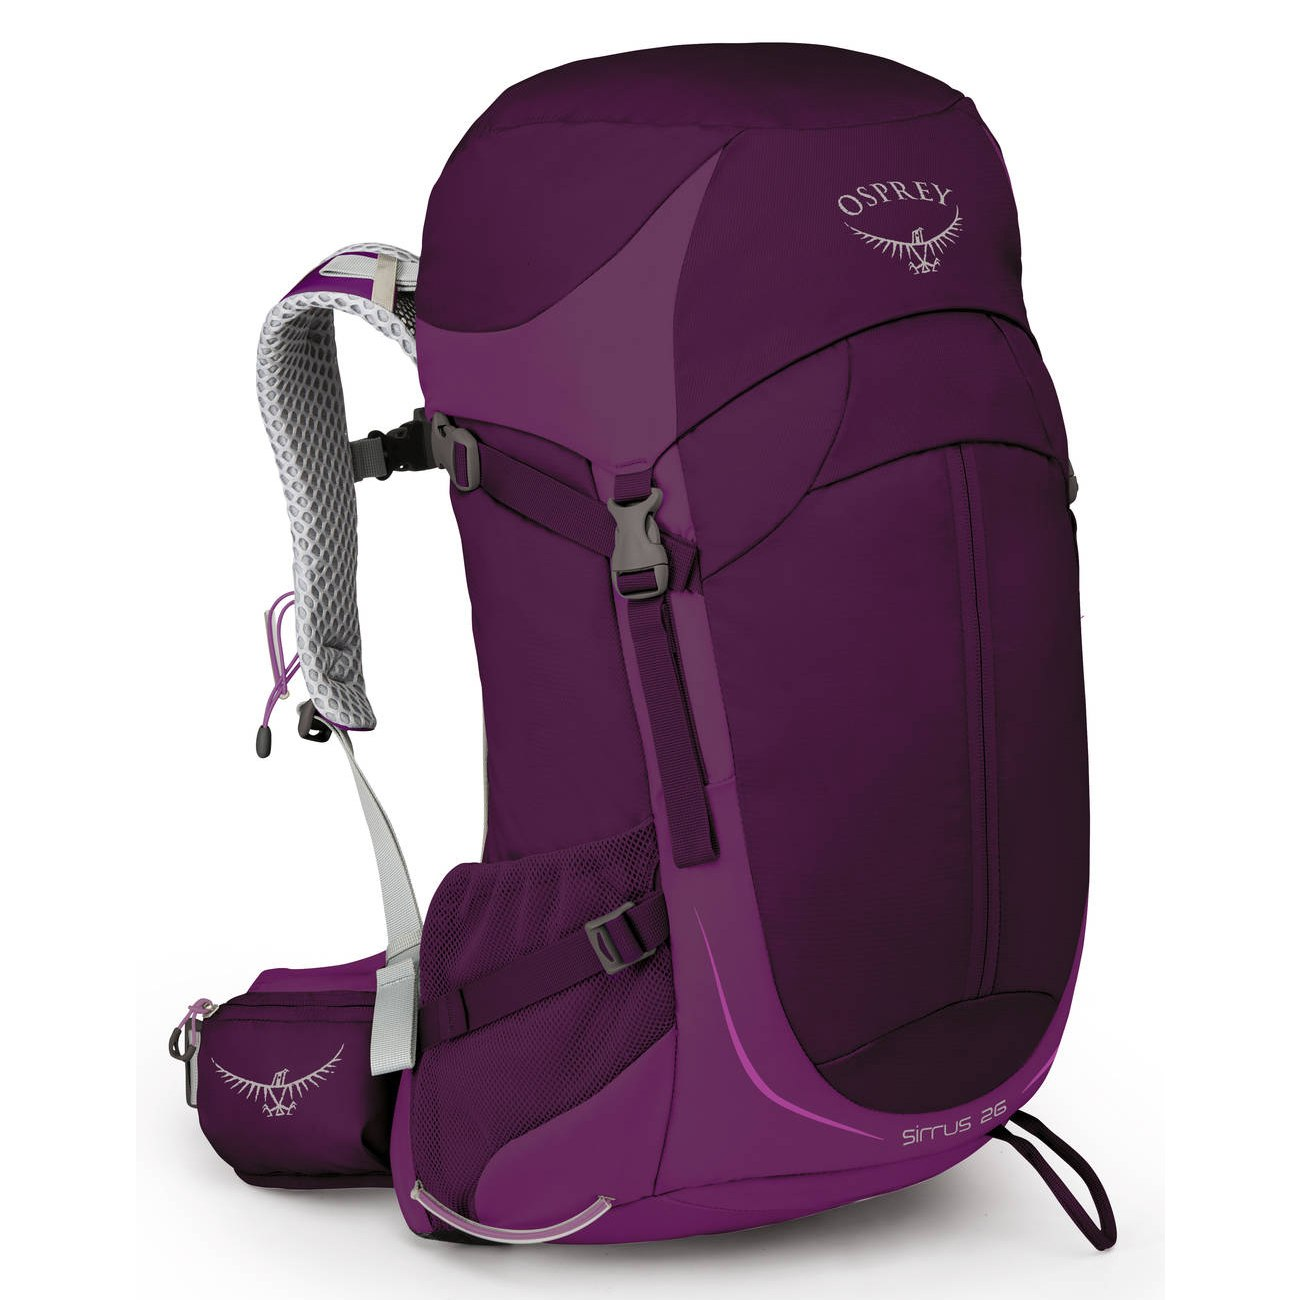 Osprey Sirrus 26 - Womens Backpack - Ruska Purple